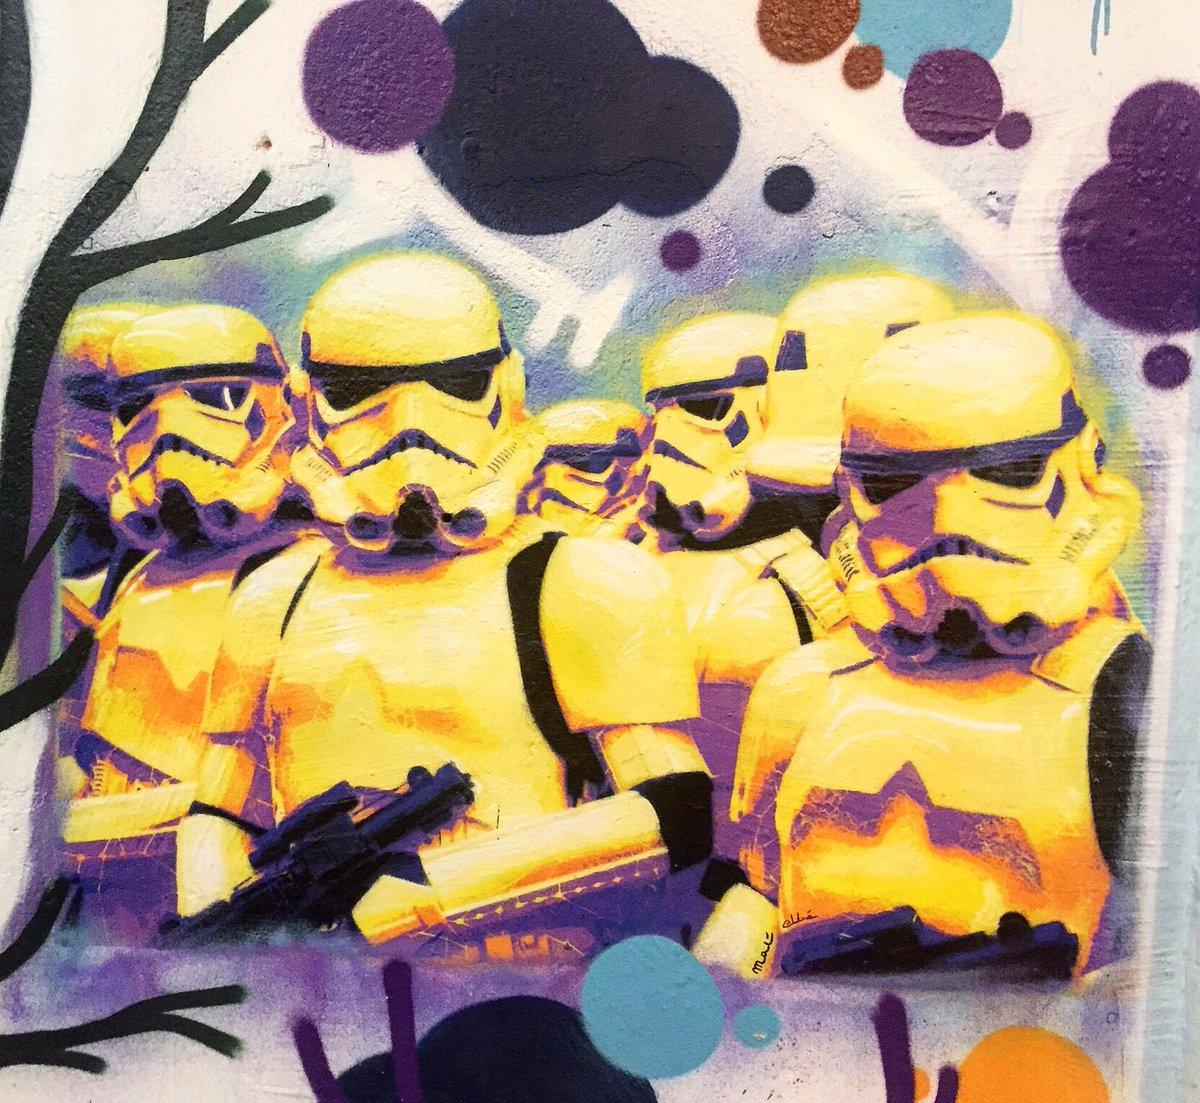 Stormtrooper squad by #olivierbat #matelbe #stormtrooper #starwars #pochoir #darkside #streetart #graff #spray<br>http://pic.twitter.com/fHFO3rJcuJ